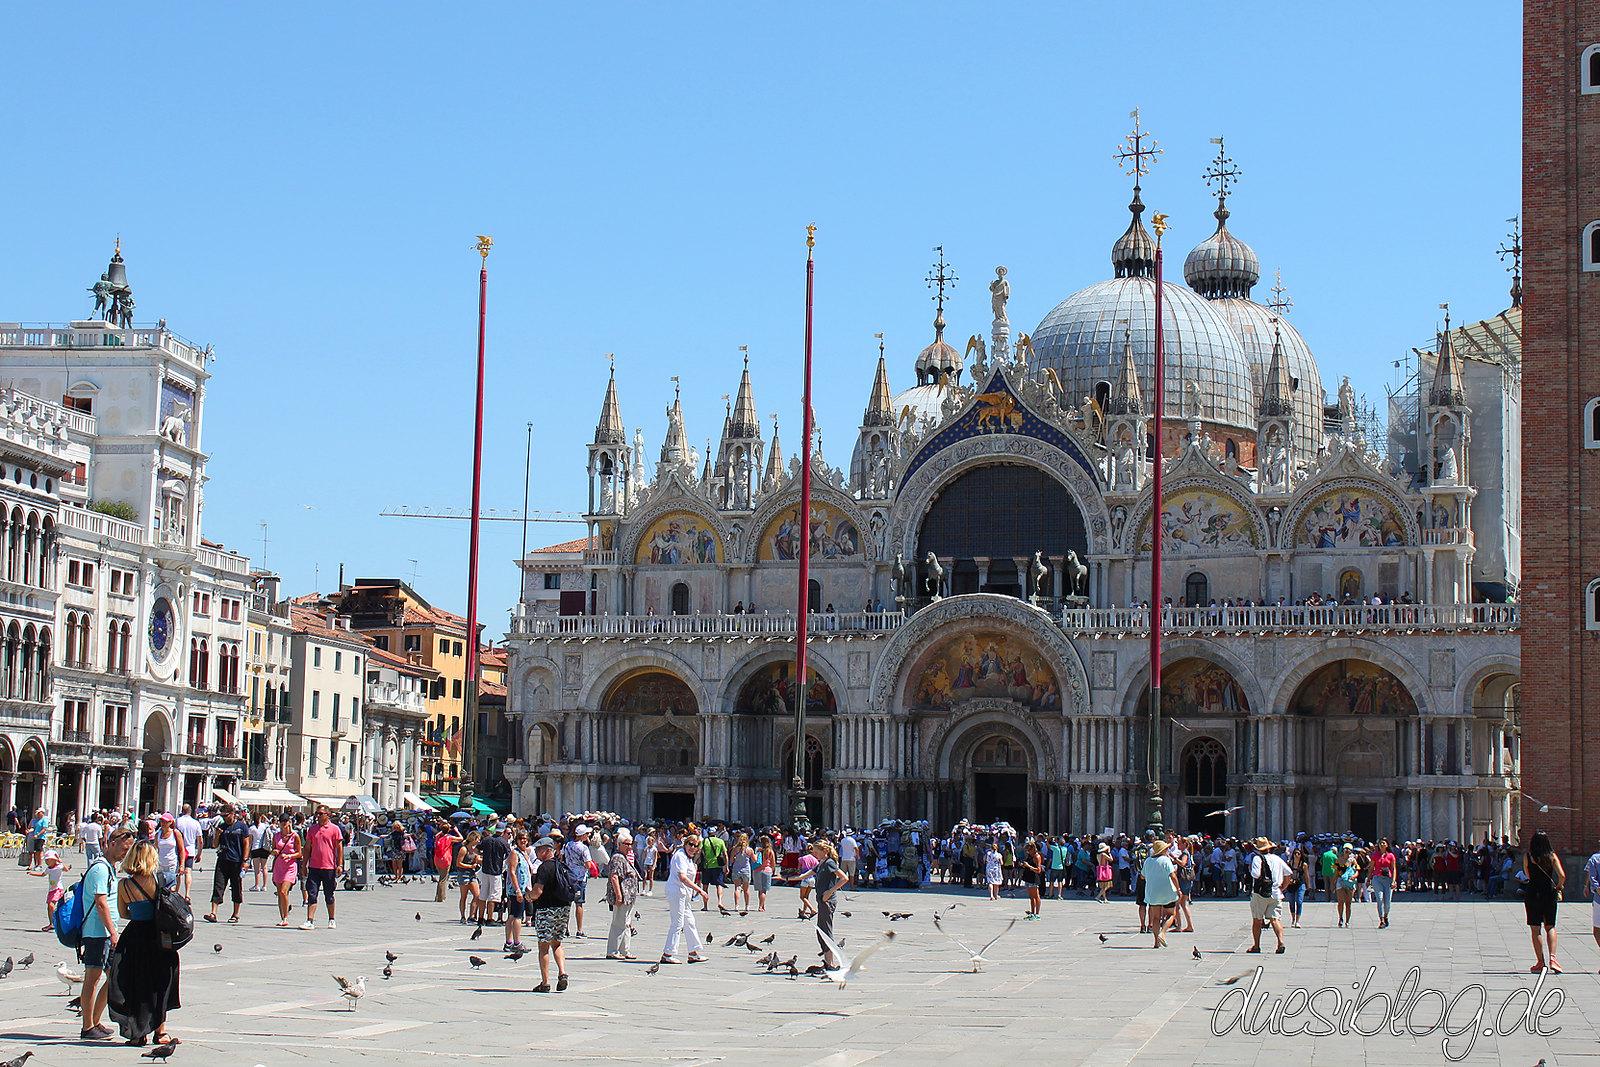 Venice Piazza San Marco travelblog duesiblog 01